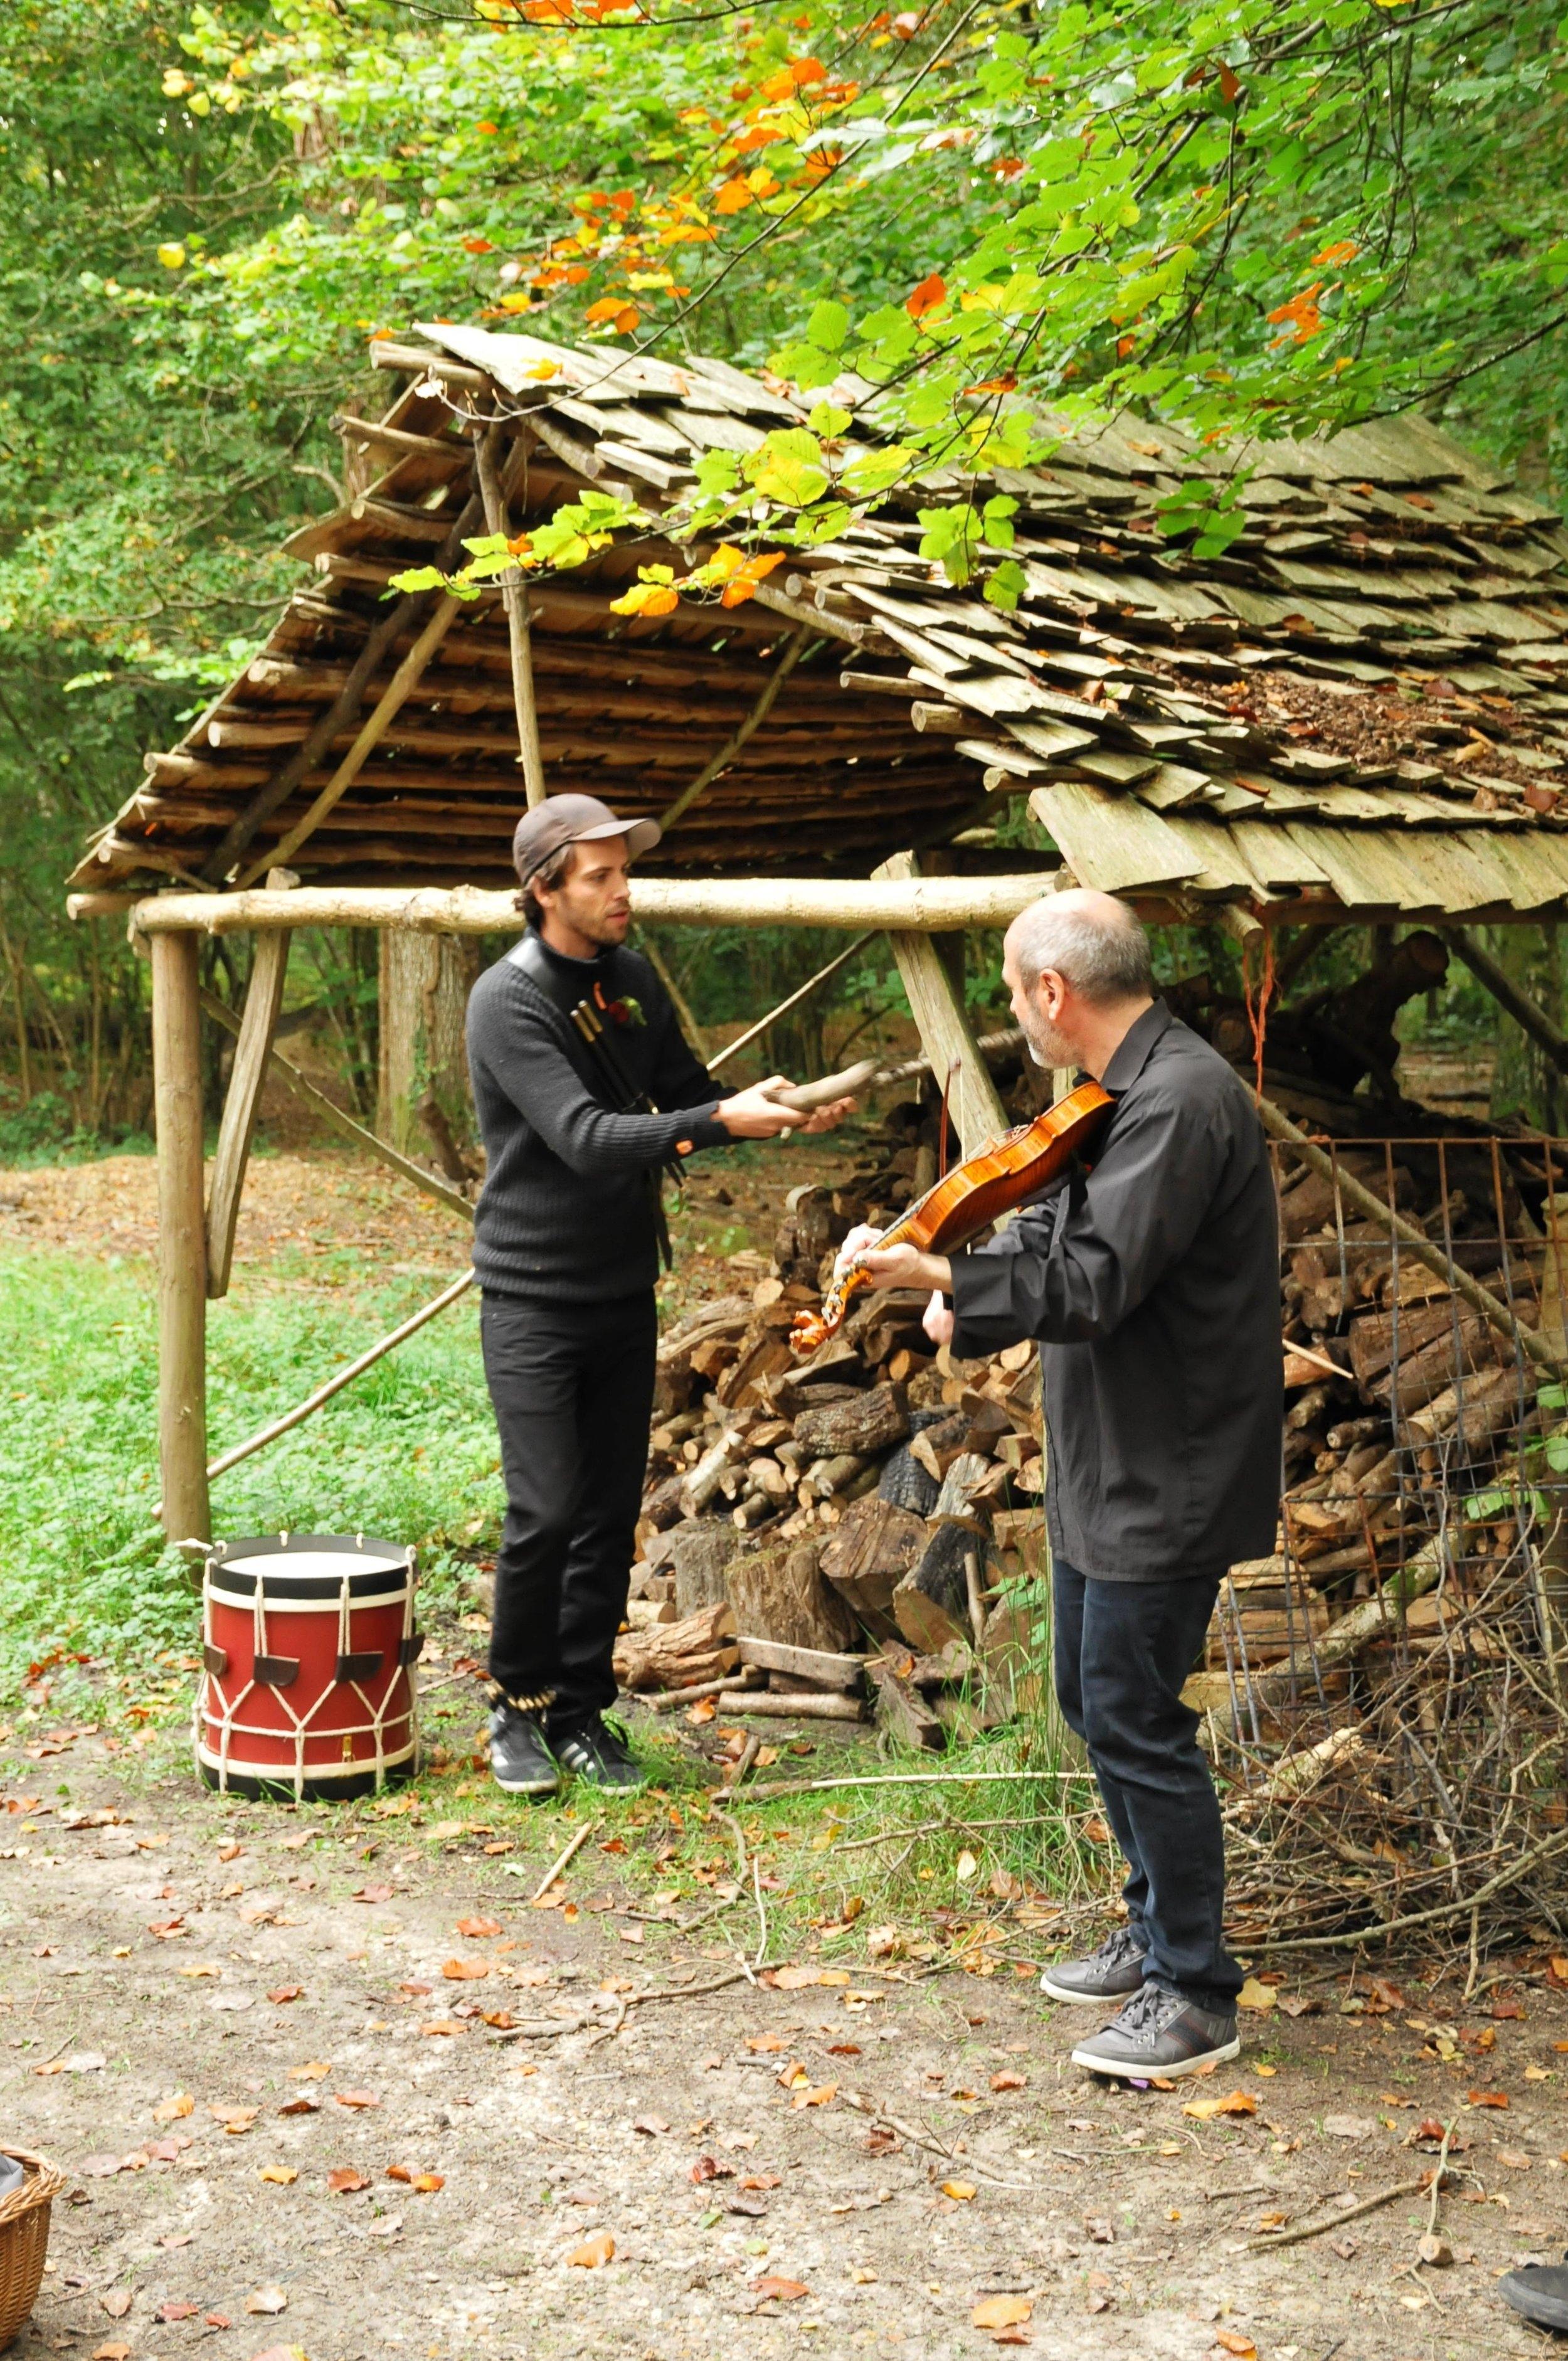 Songs for Wild Horses by Nils Økland and Øyvind Skarbø